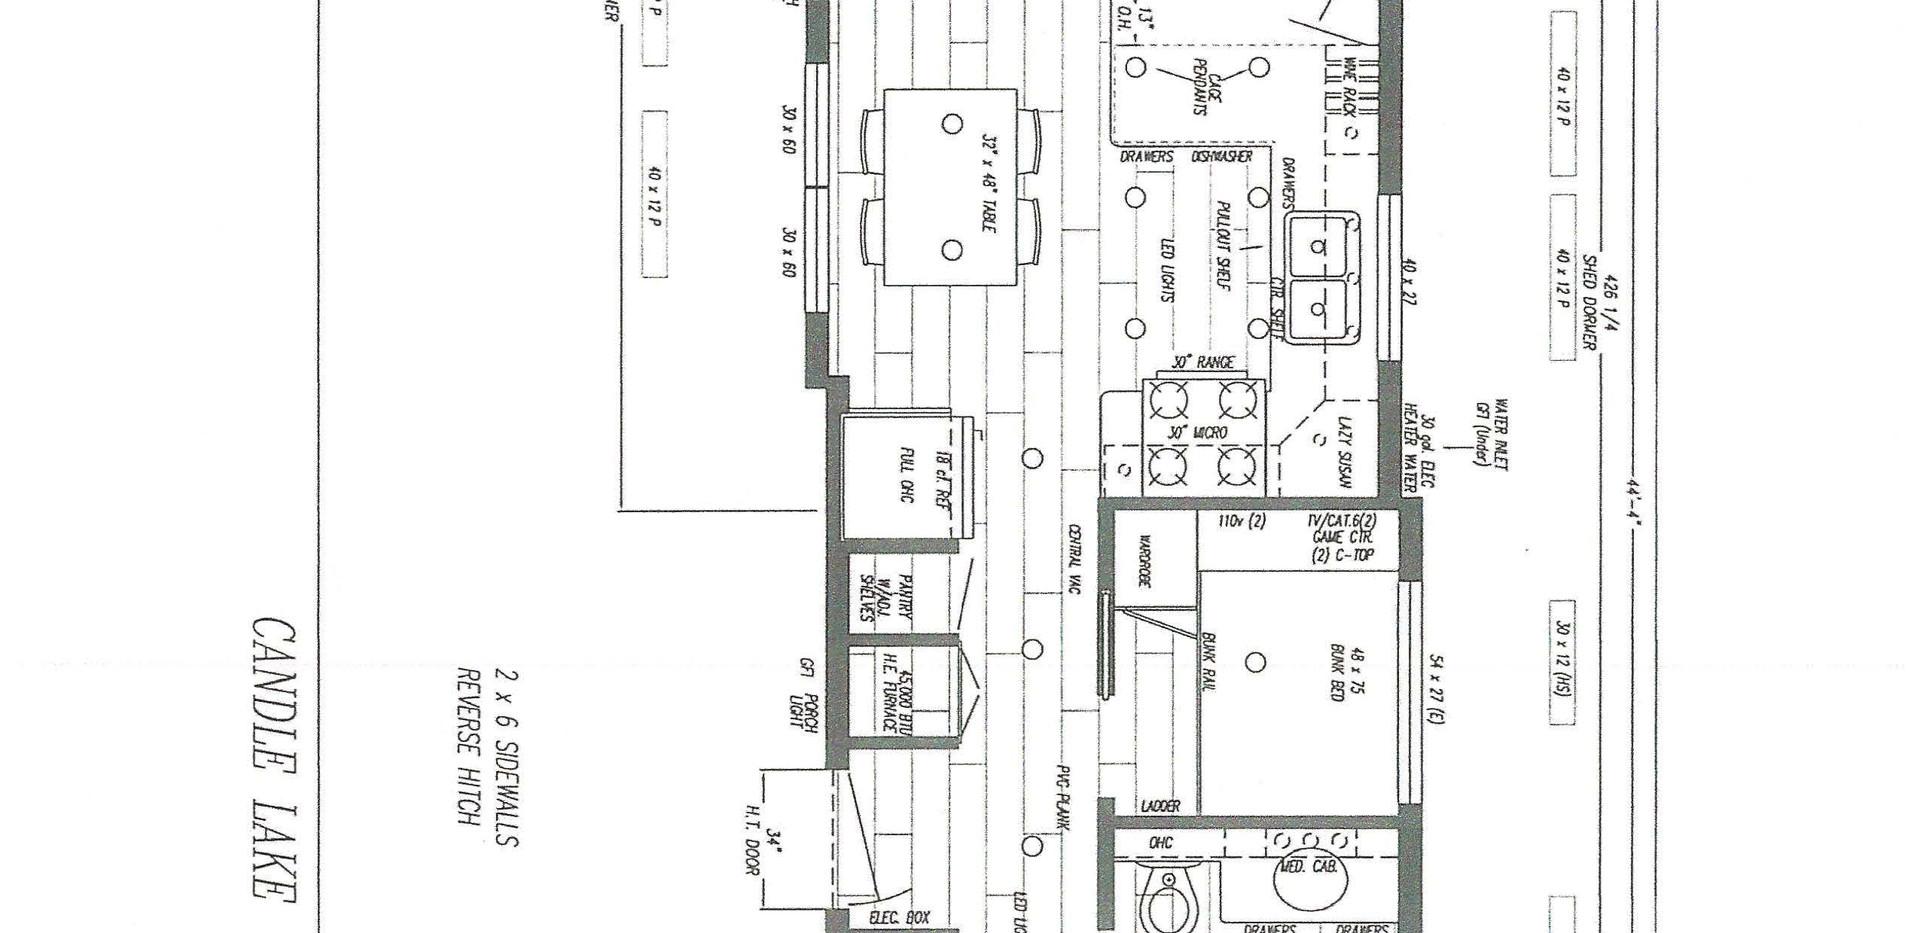 New stock Candle Lake floor plan.jpg